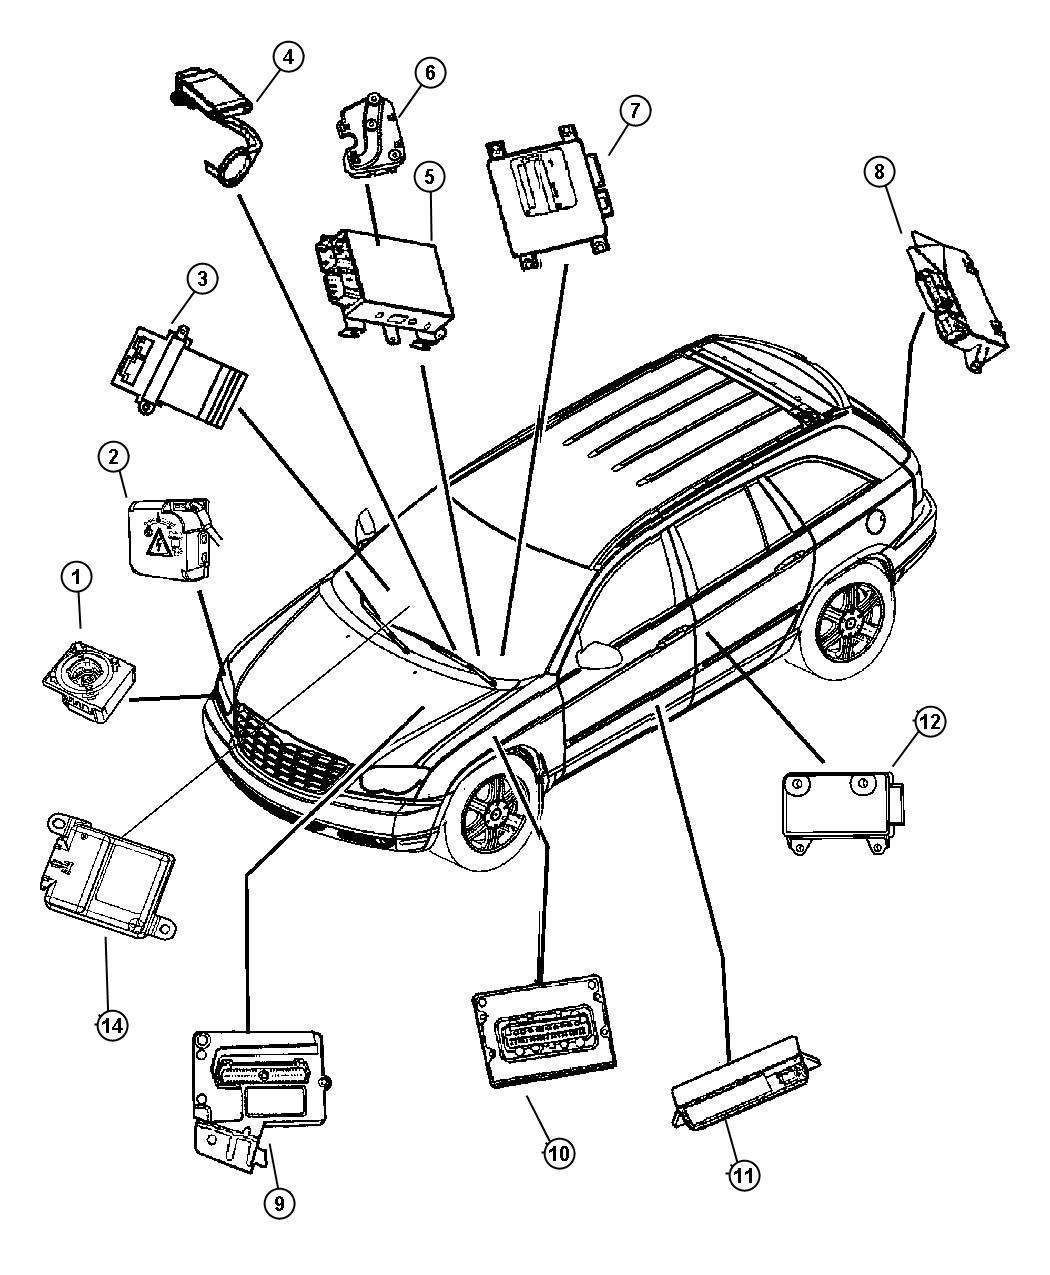 2008 Chrysler Pacifica Module. Seat memory. [-cma], [cma